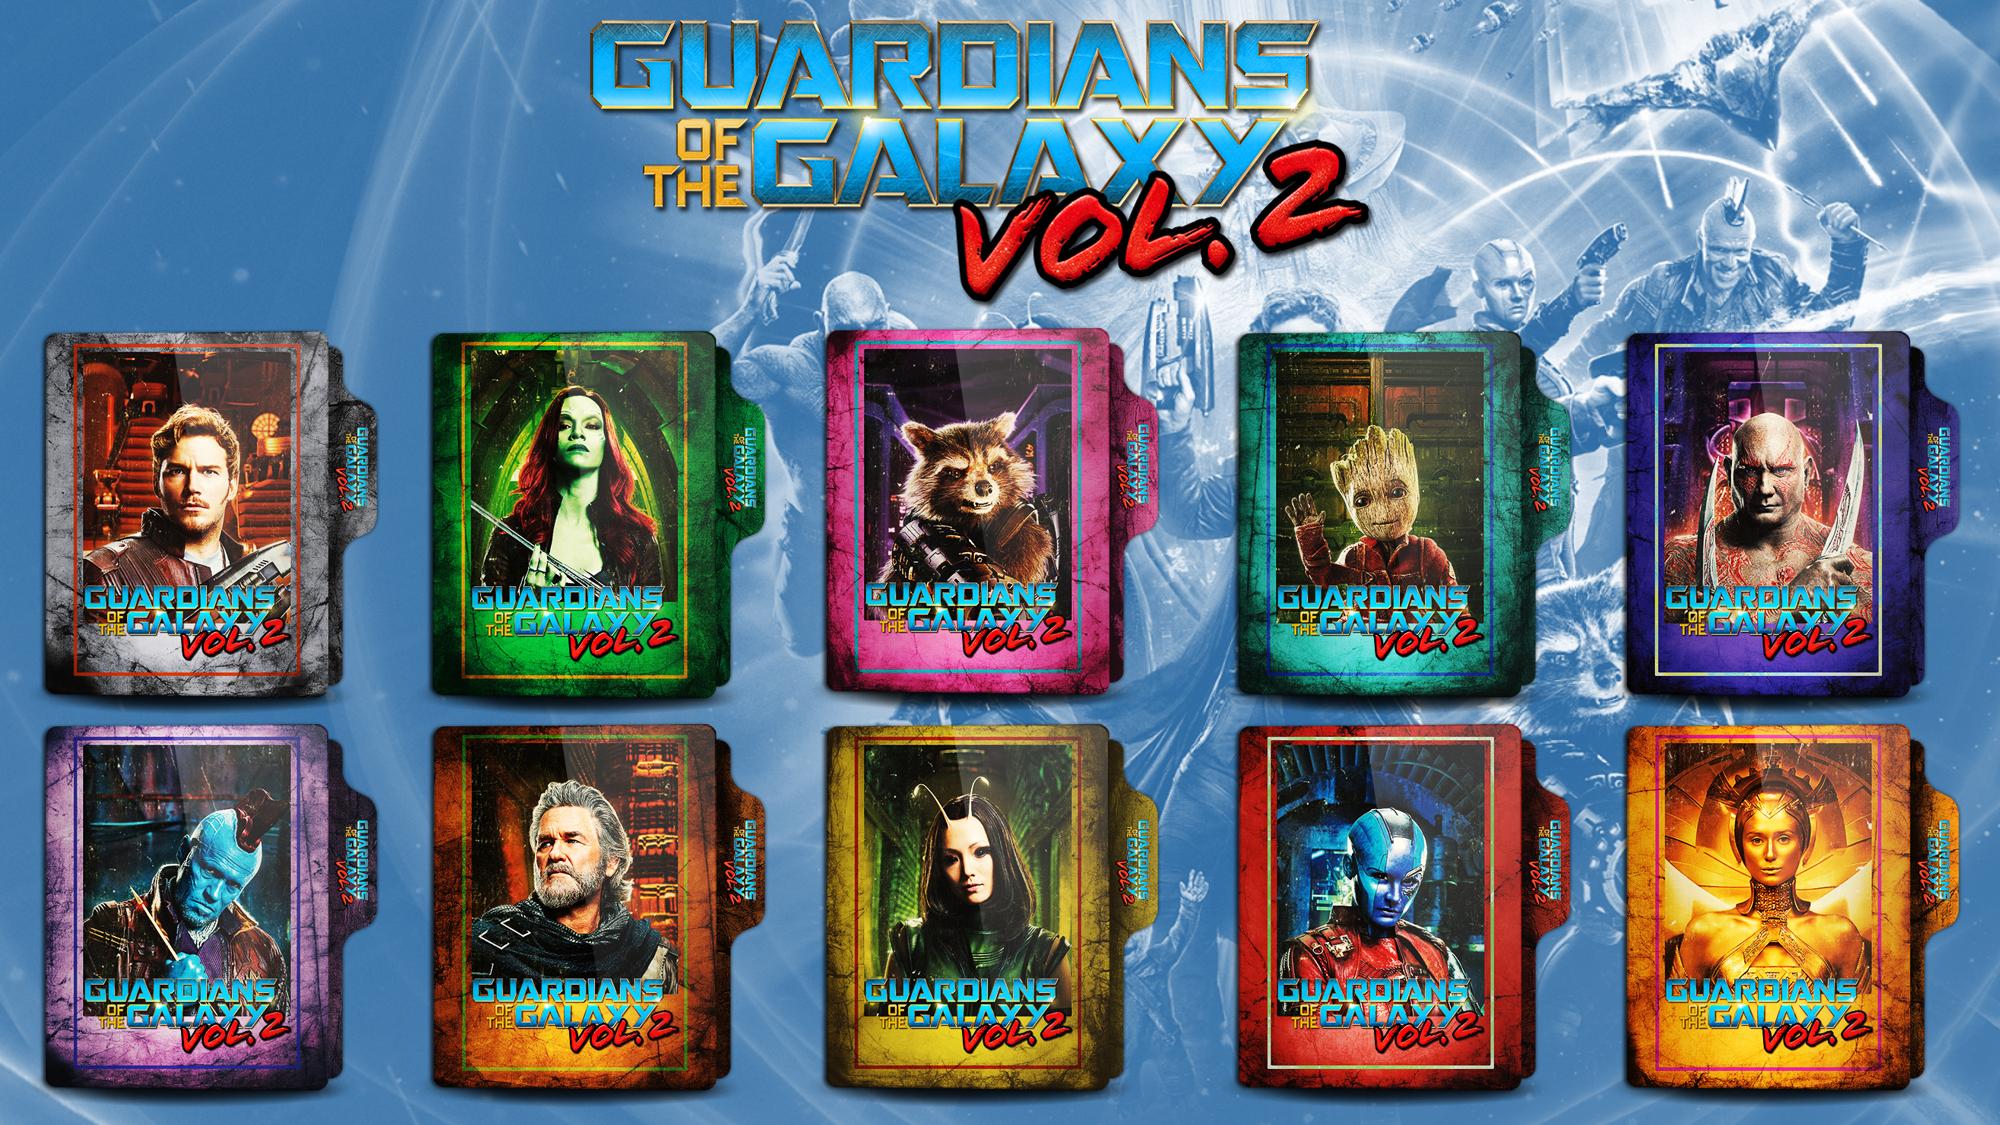 Guardians Of The Galaxy Icon Wwwpicsbudcom